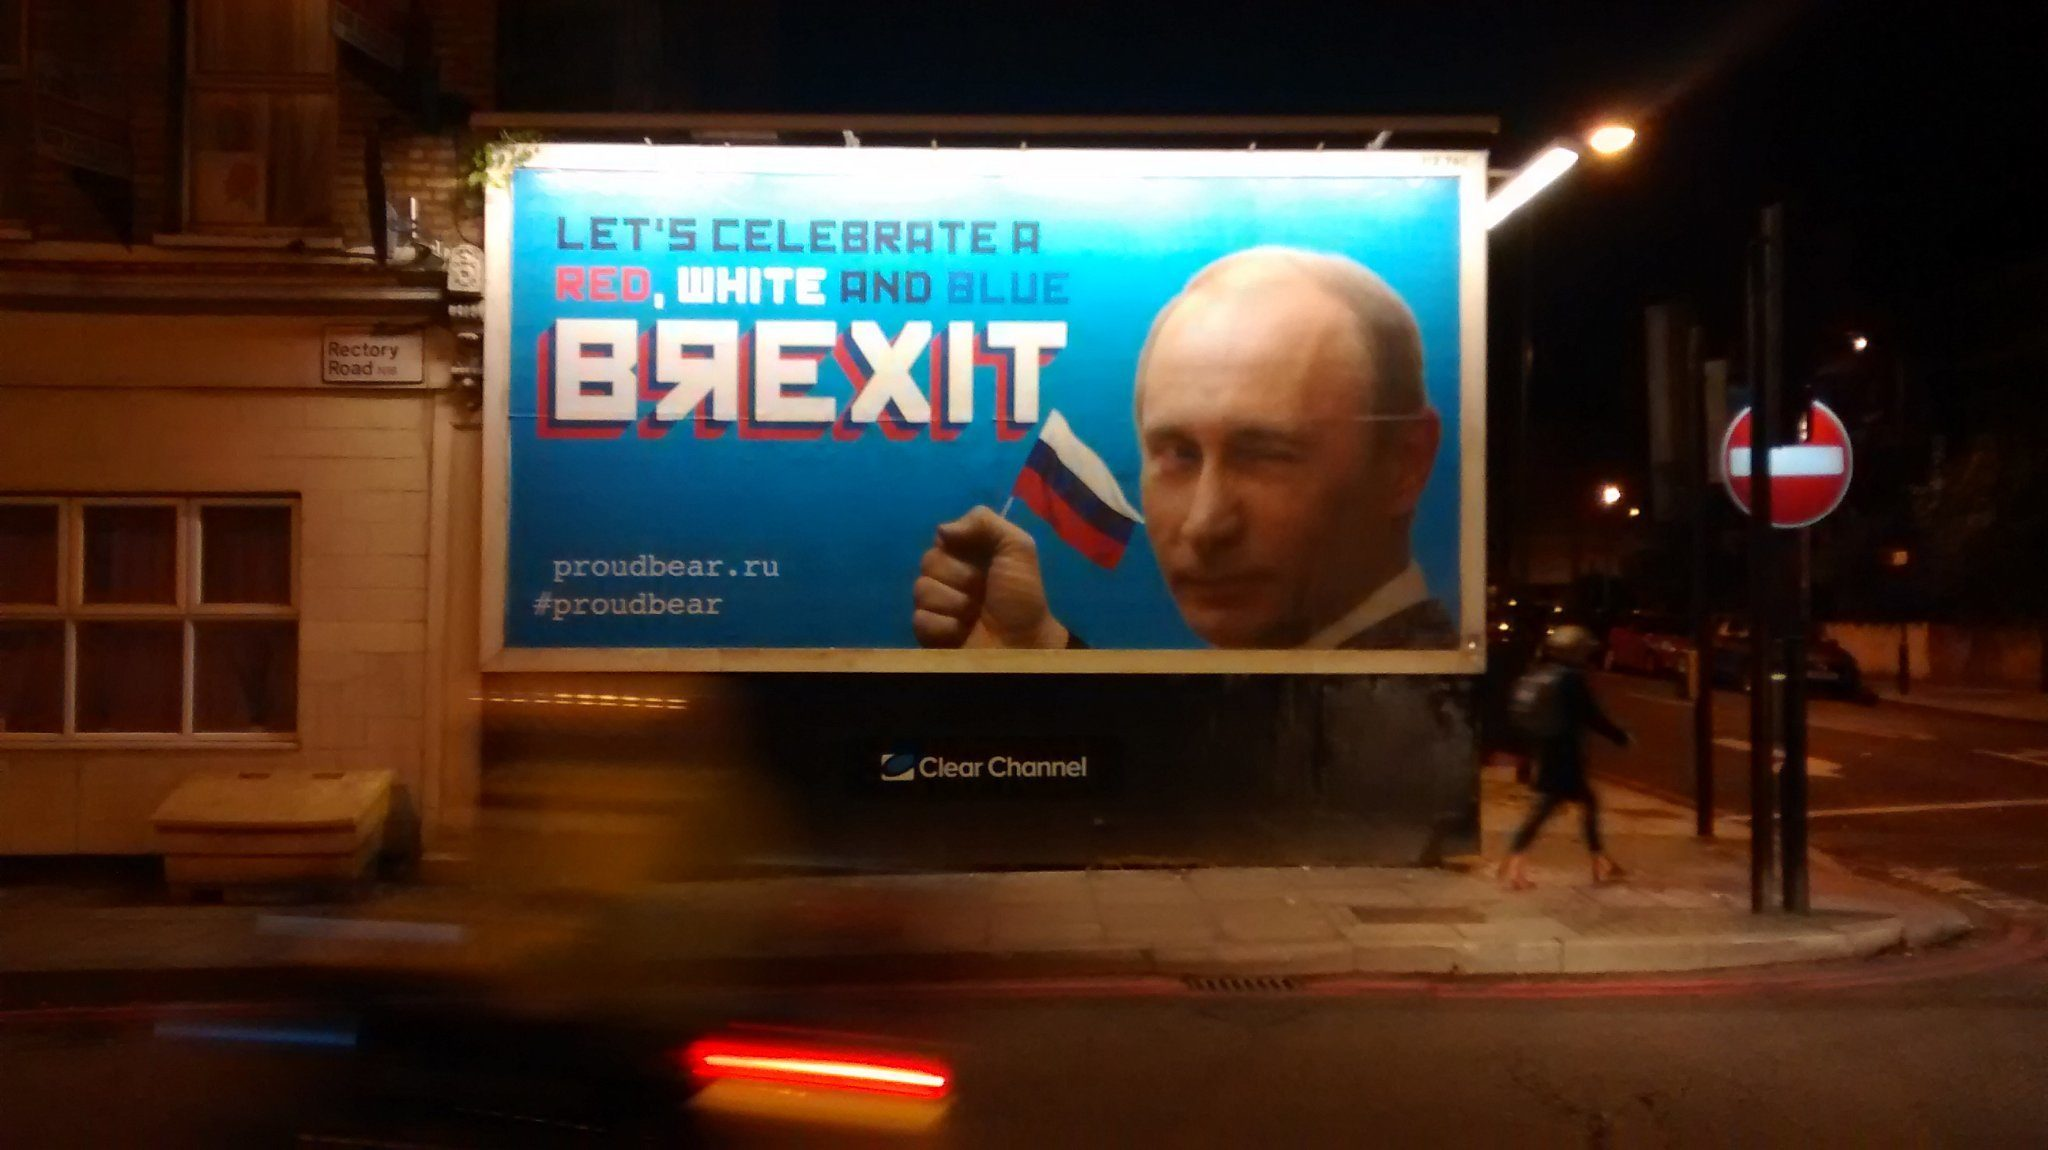 Epic troll: #Pr0udBear billboards pop up in UK celebrating Putin's Brexit victory -- Sott.net